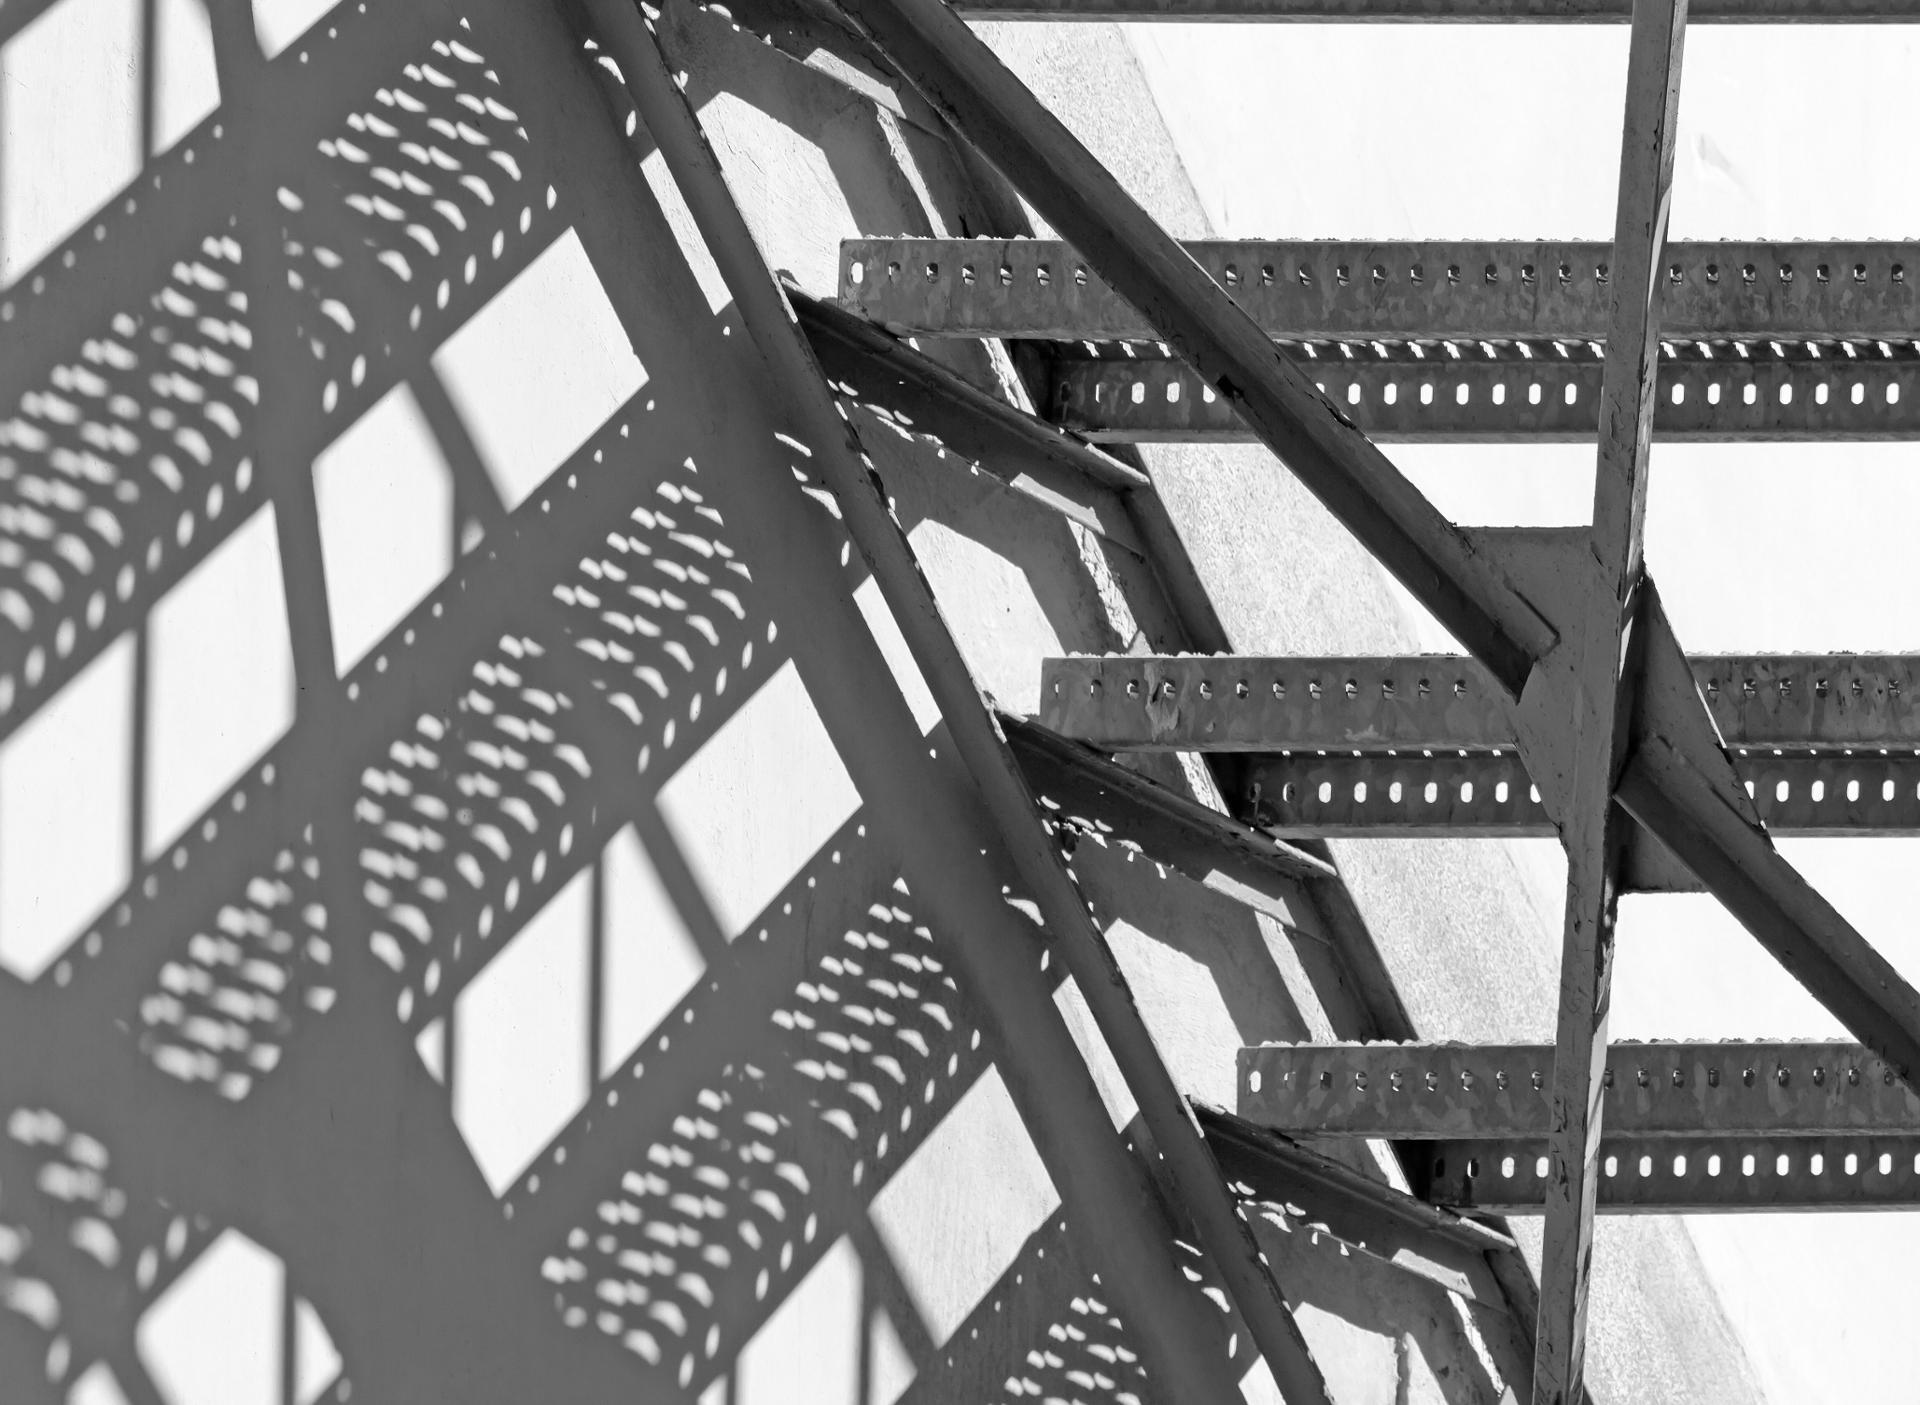 Escalier métallique jeu d'ombre